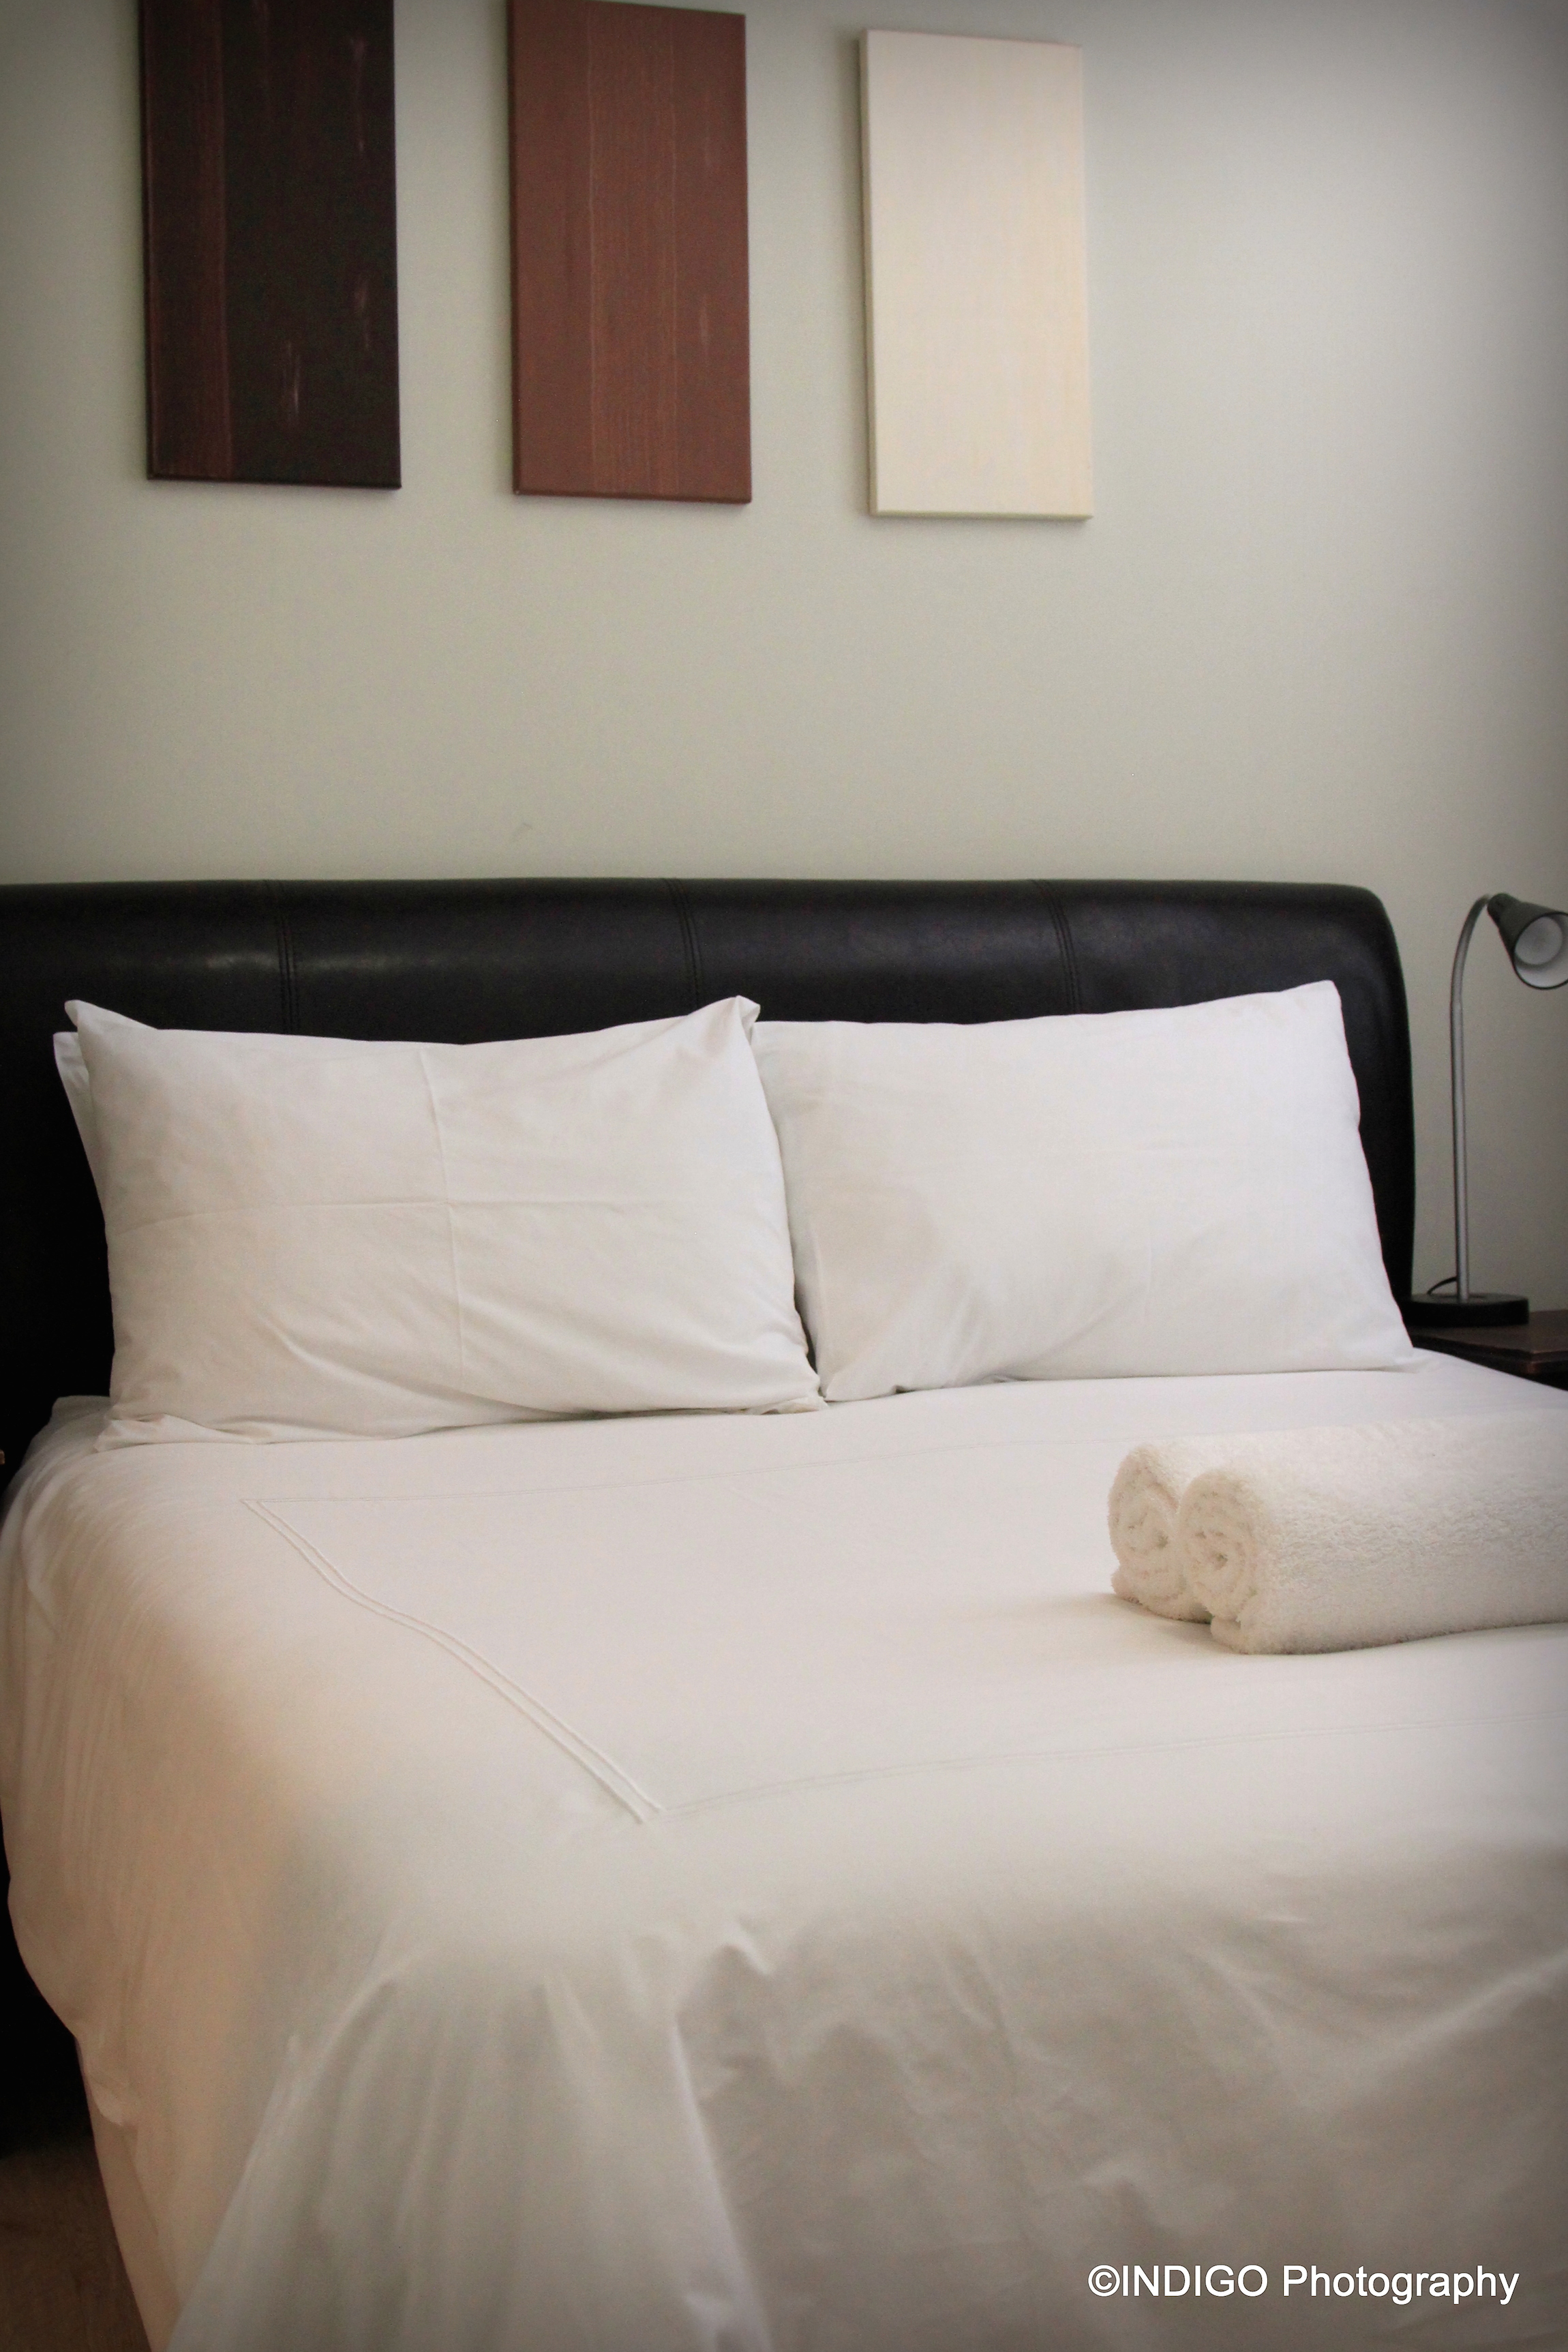 Majorca Self-Catering Apartments in Century City, Cape ...